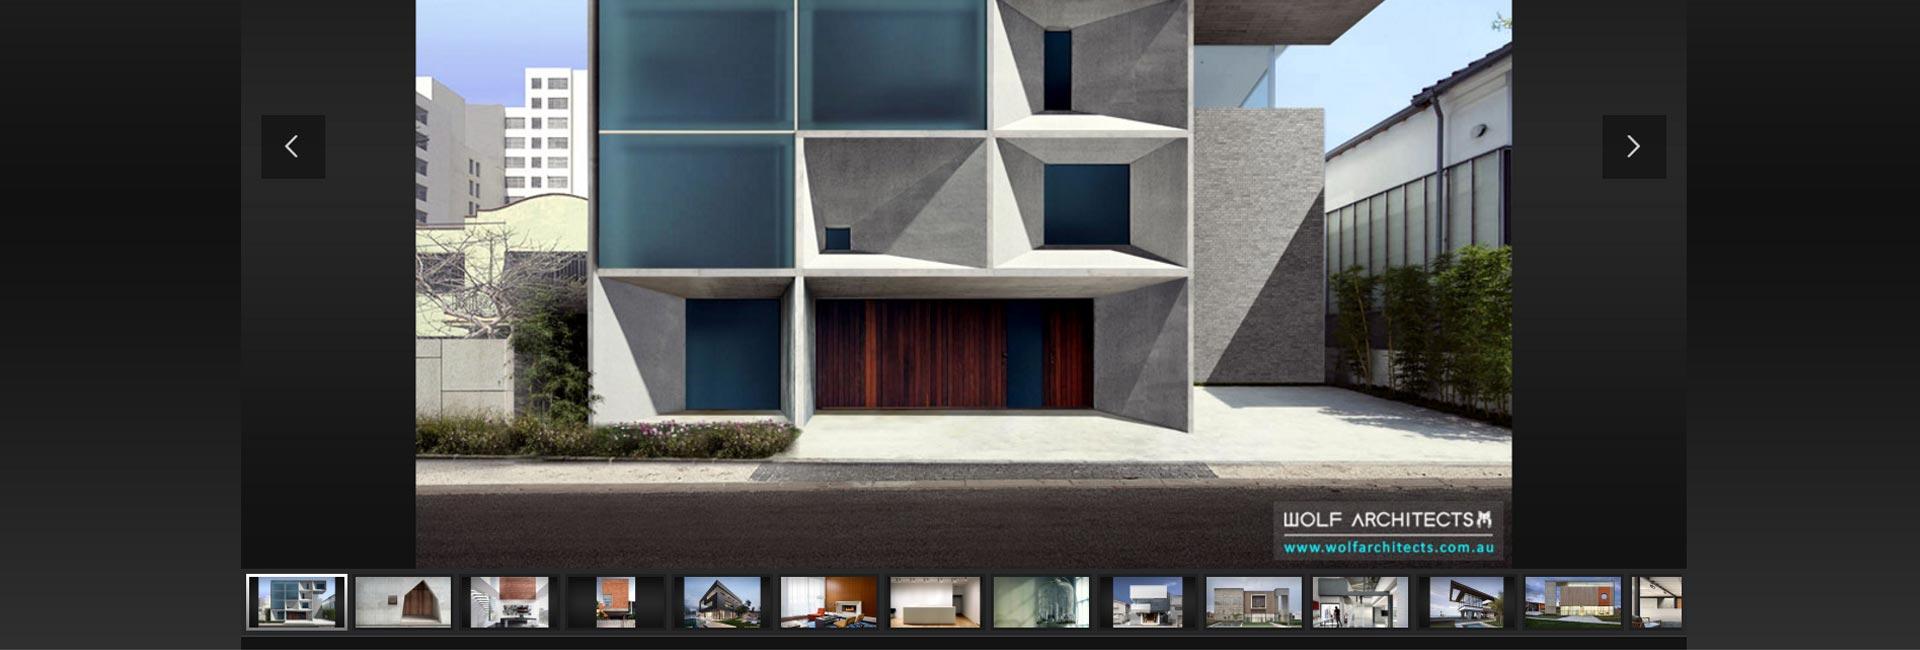 headerslider-melbourne-architects-commercial